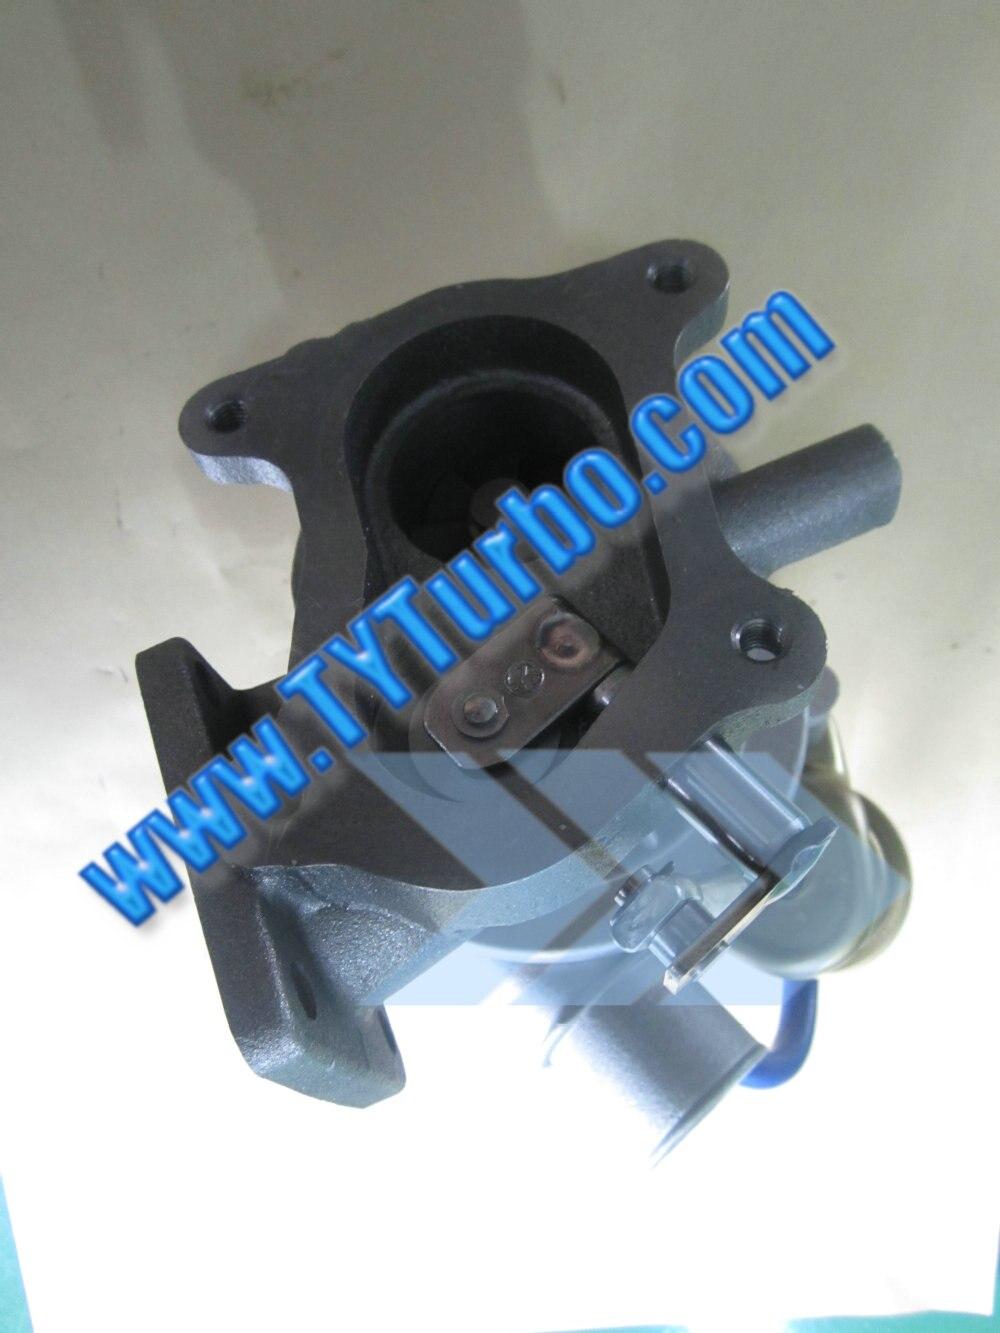 RHF5 VJ26/WL84.13.700/VCX50024/VE430090 TURBO para FO RD RANGER 2,5 D 4X4 1999 con 115 J97A motor 2.5L 109HP